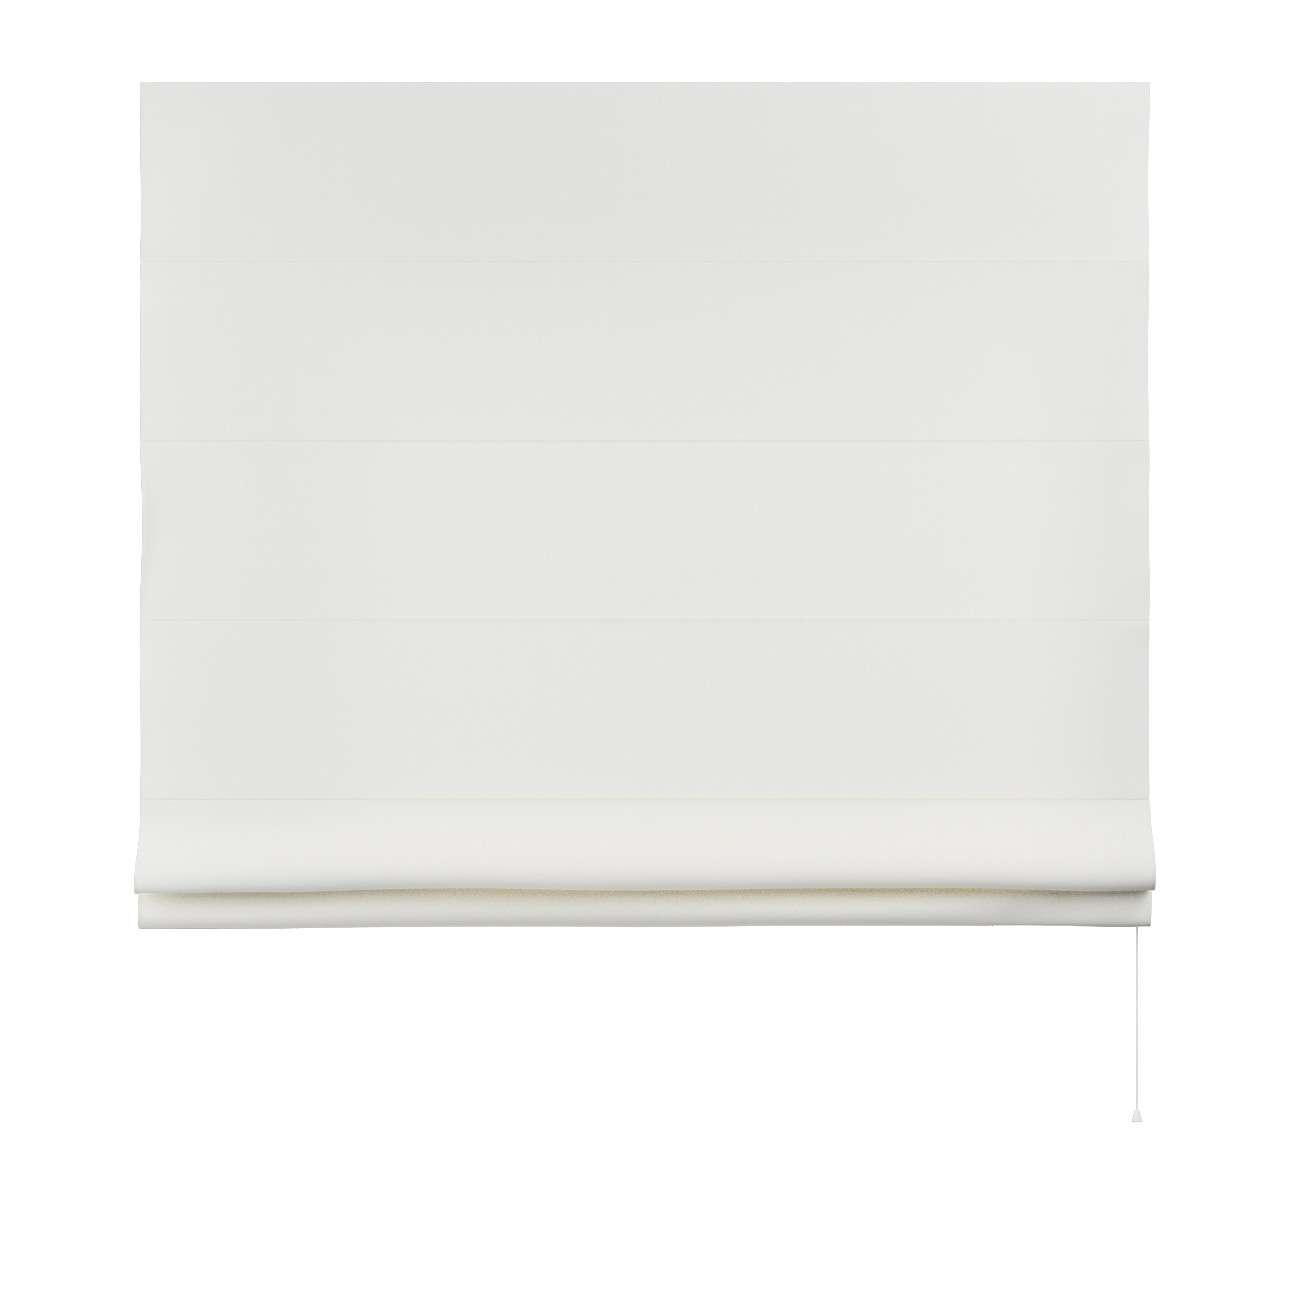 Raffrollo Capri von der Kollektion Cotton Panama, Stoff: 702-34